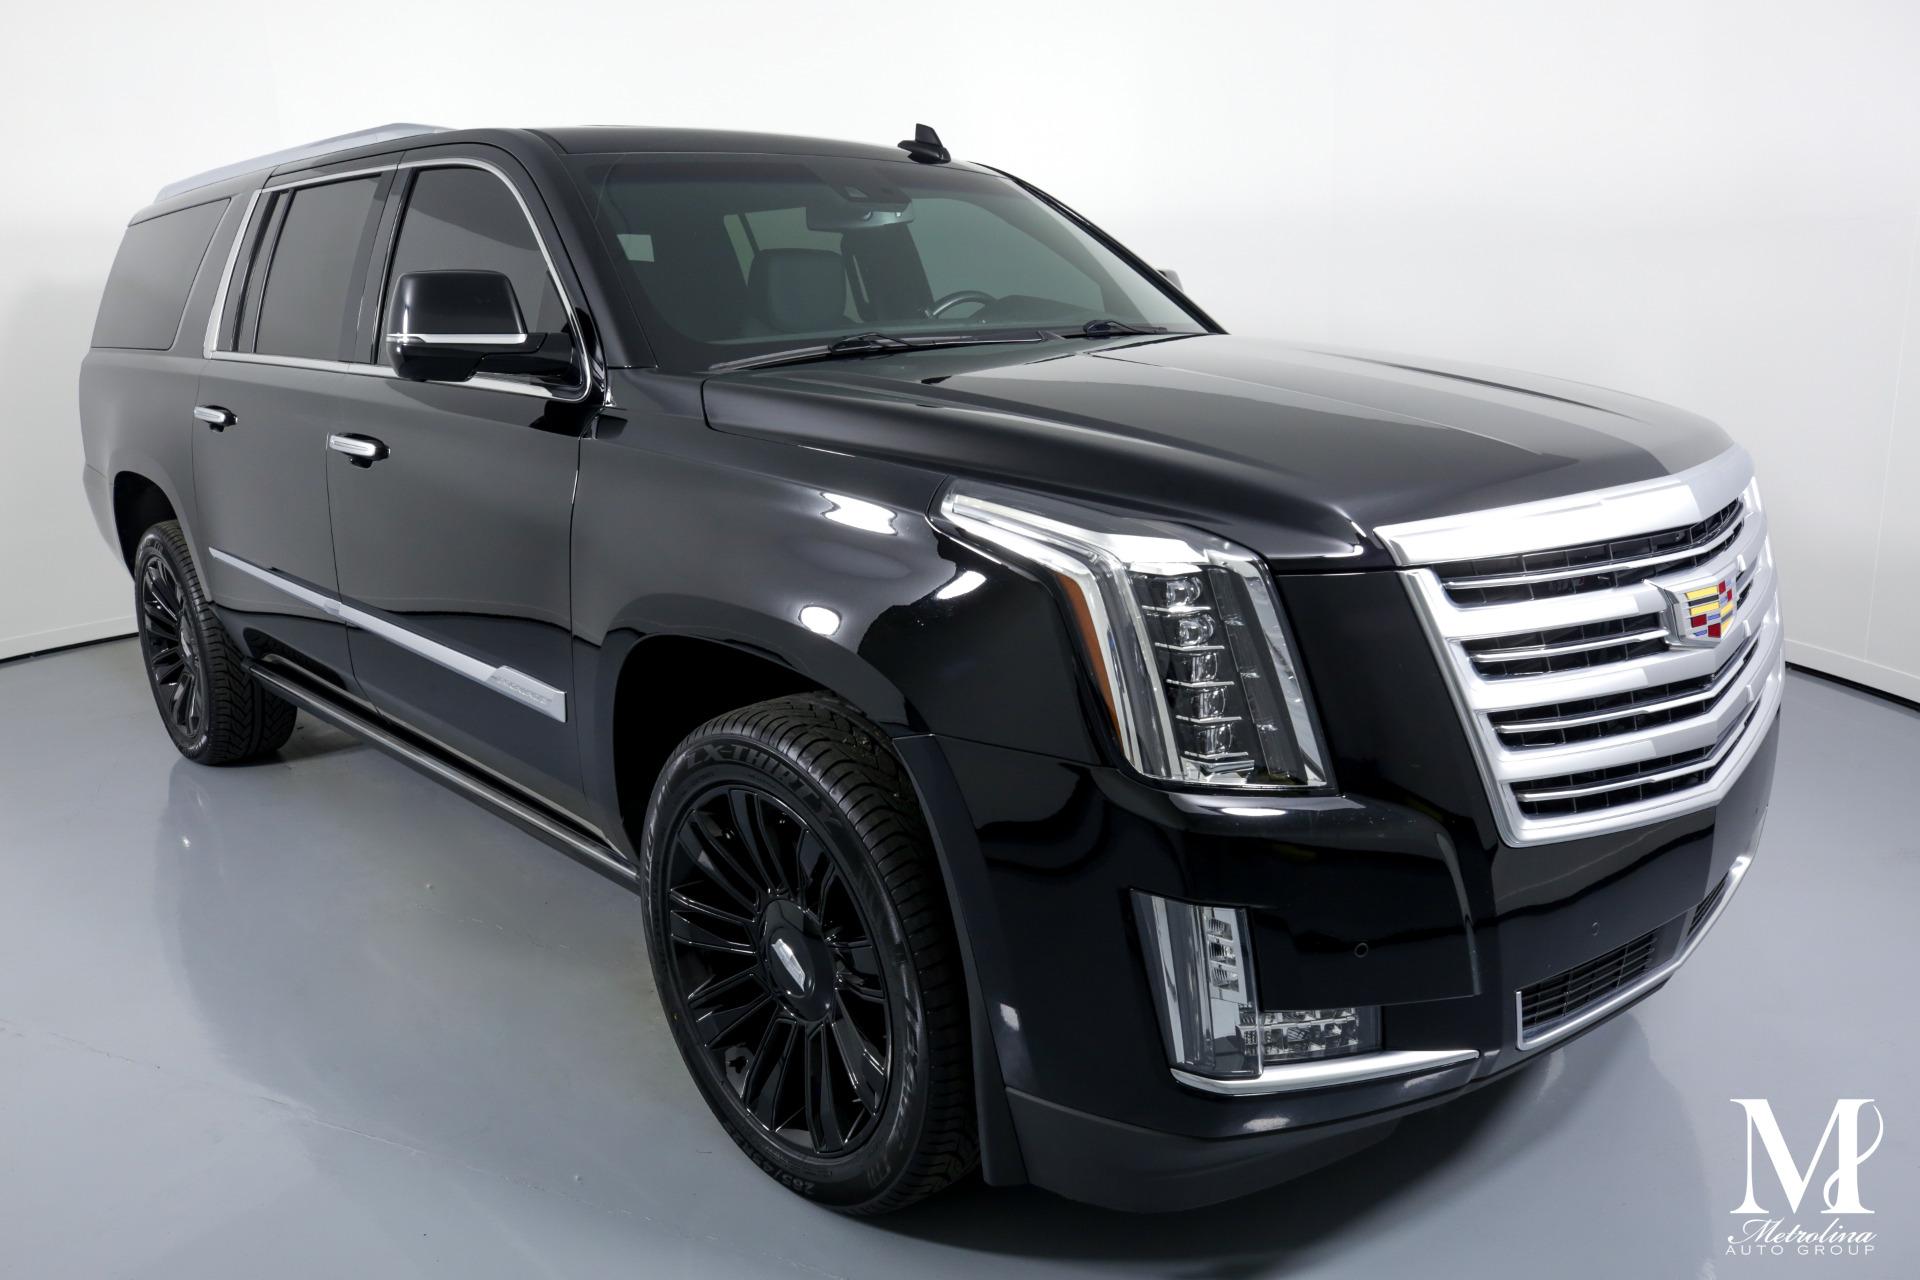 Used 2016 Cadillac Escalade ESV Platinum for sale $54,996 at Metrolina Auto Group in Charlotte NC 28217 - 2